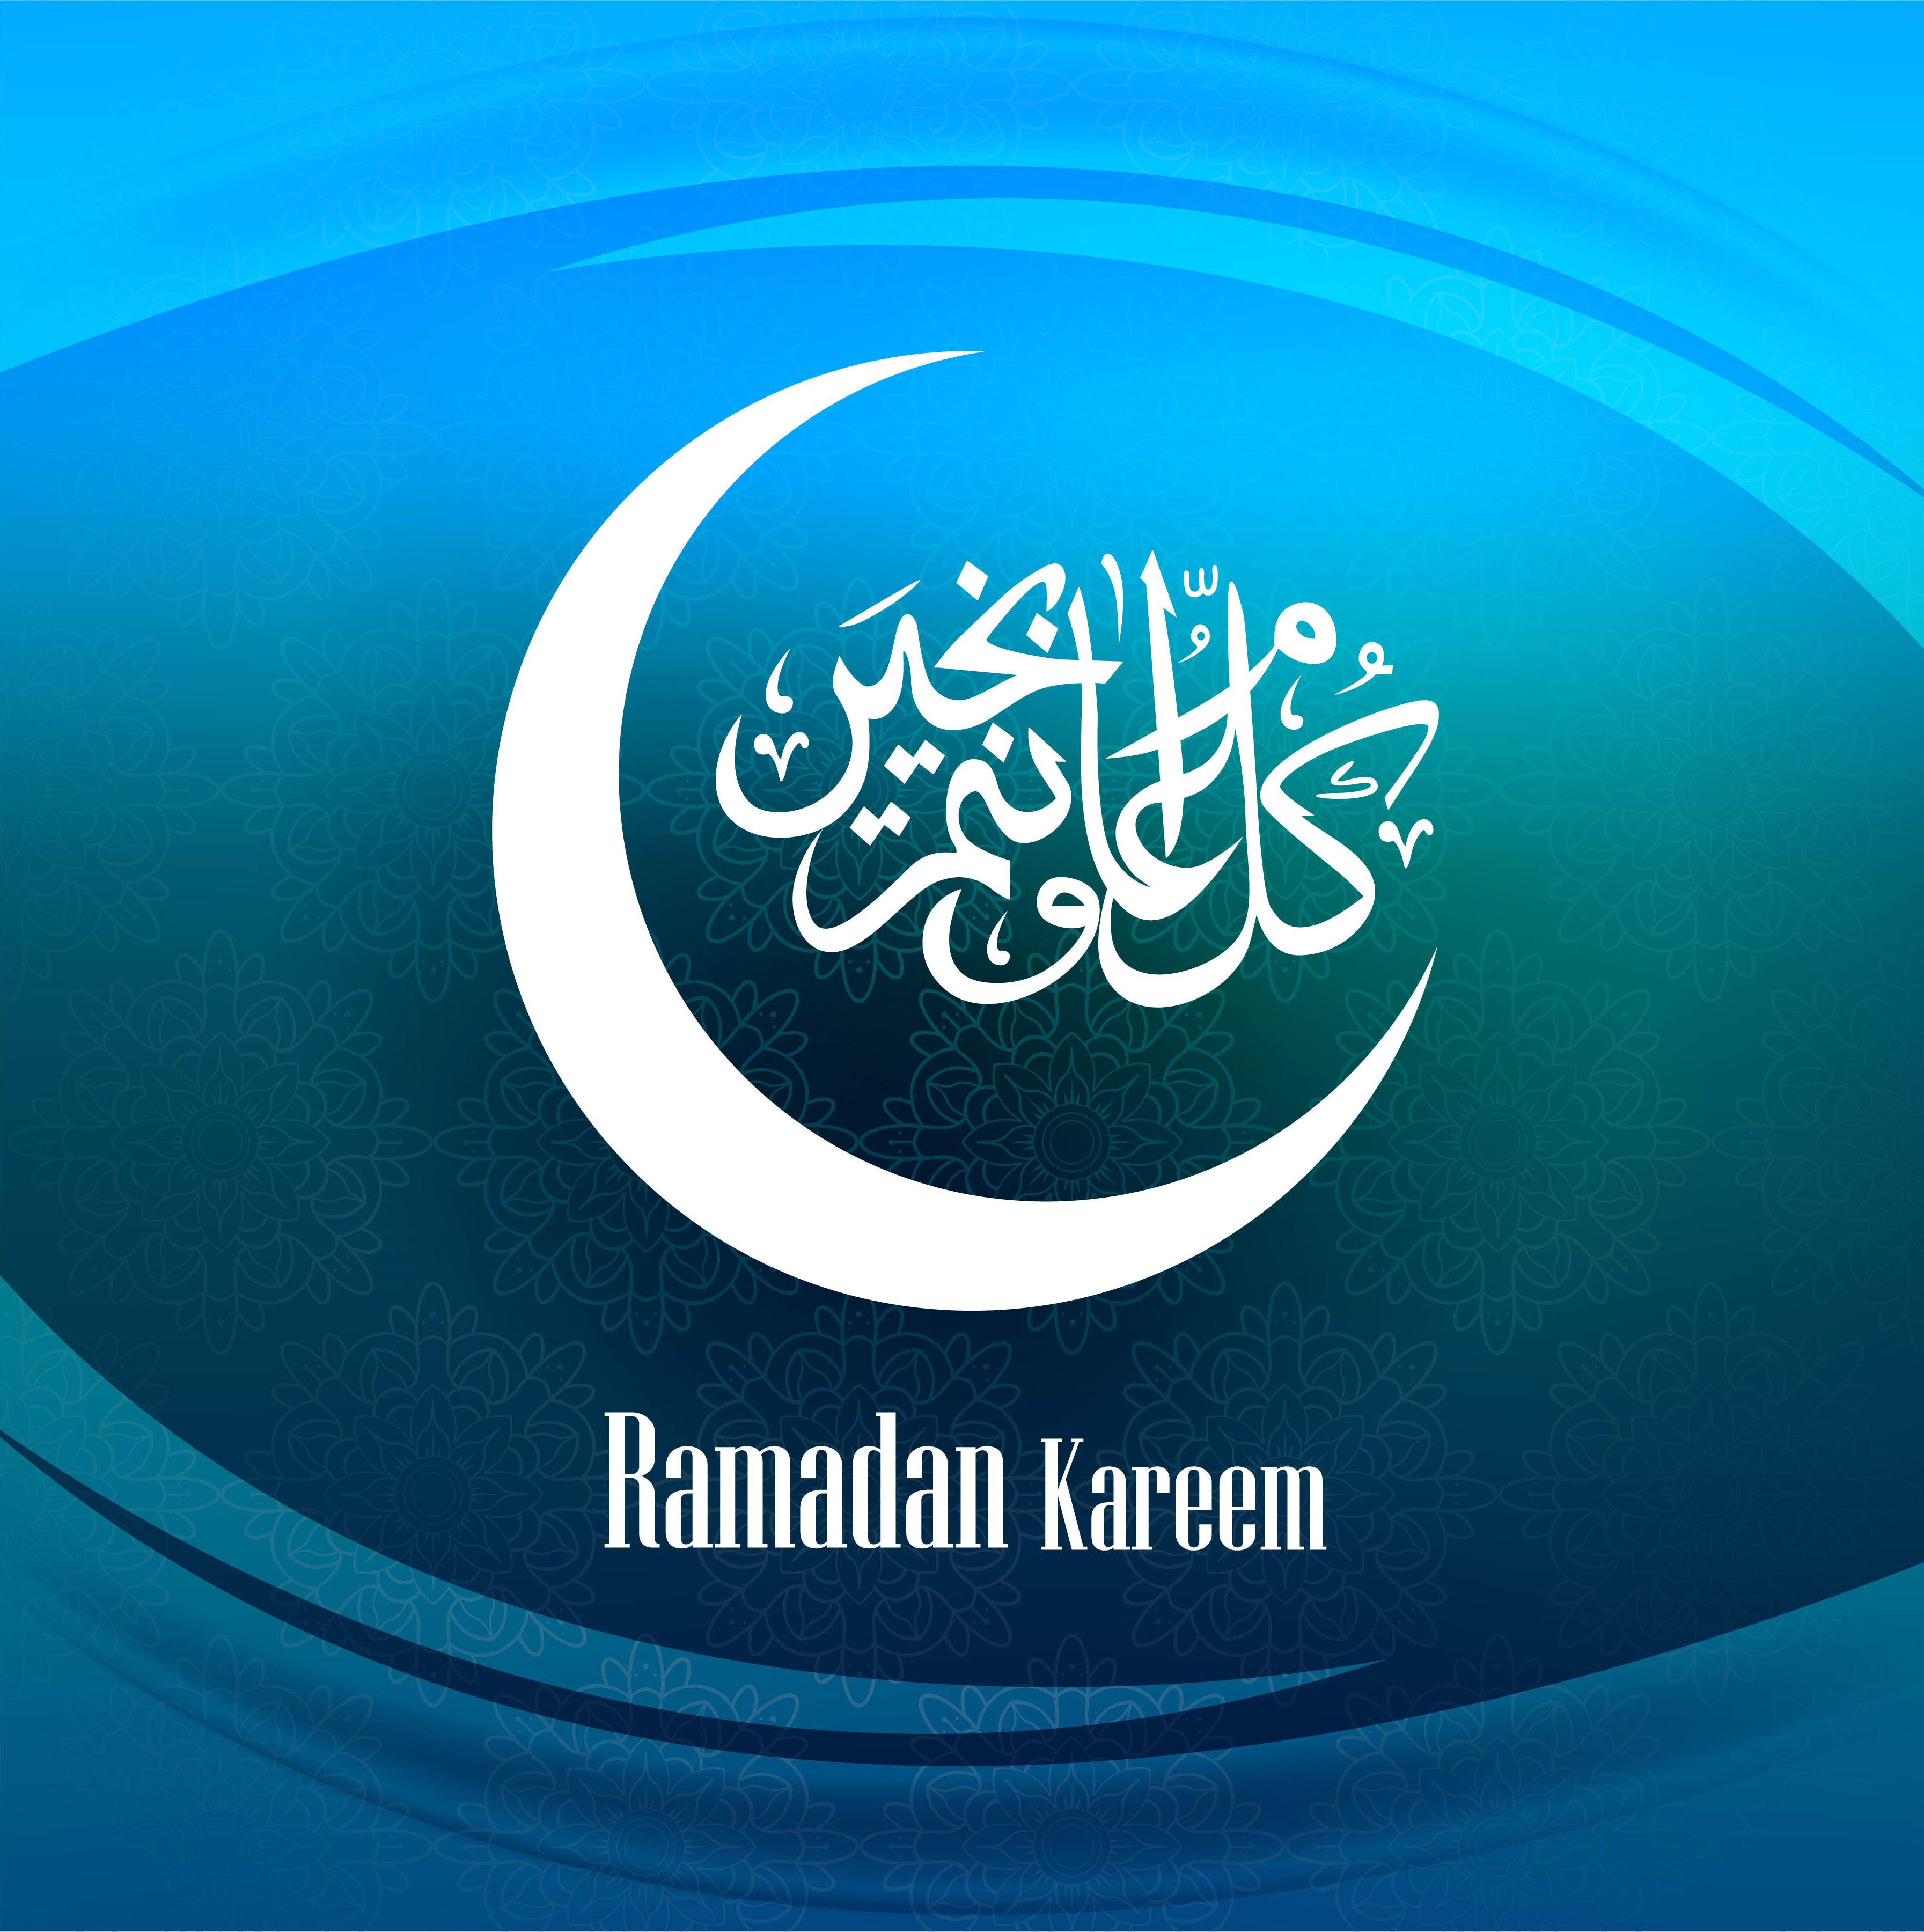 Ramadan Kareem Greeting Card Blue Background Download Free Vector